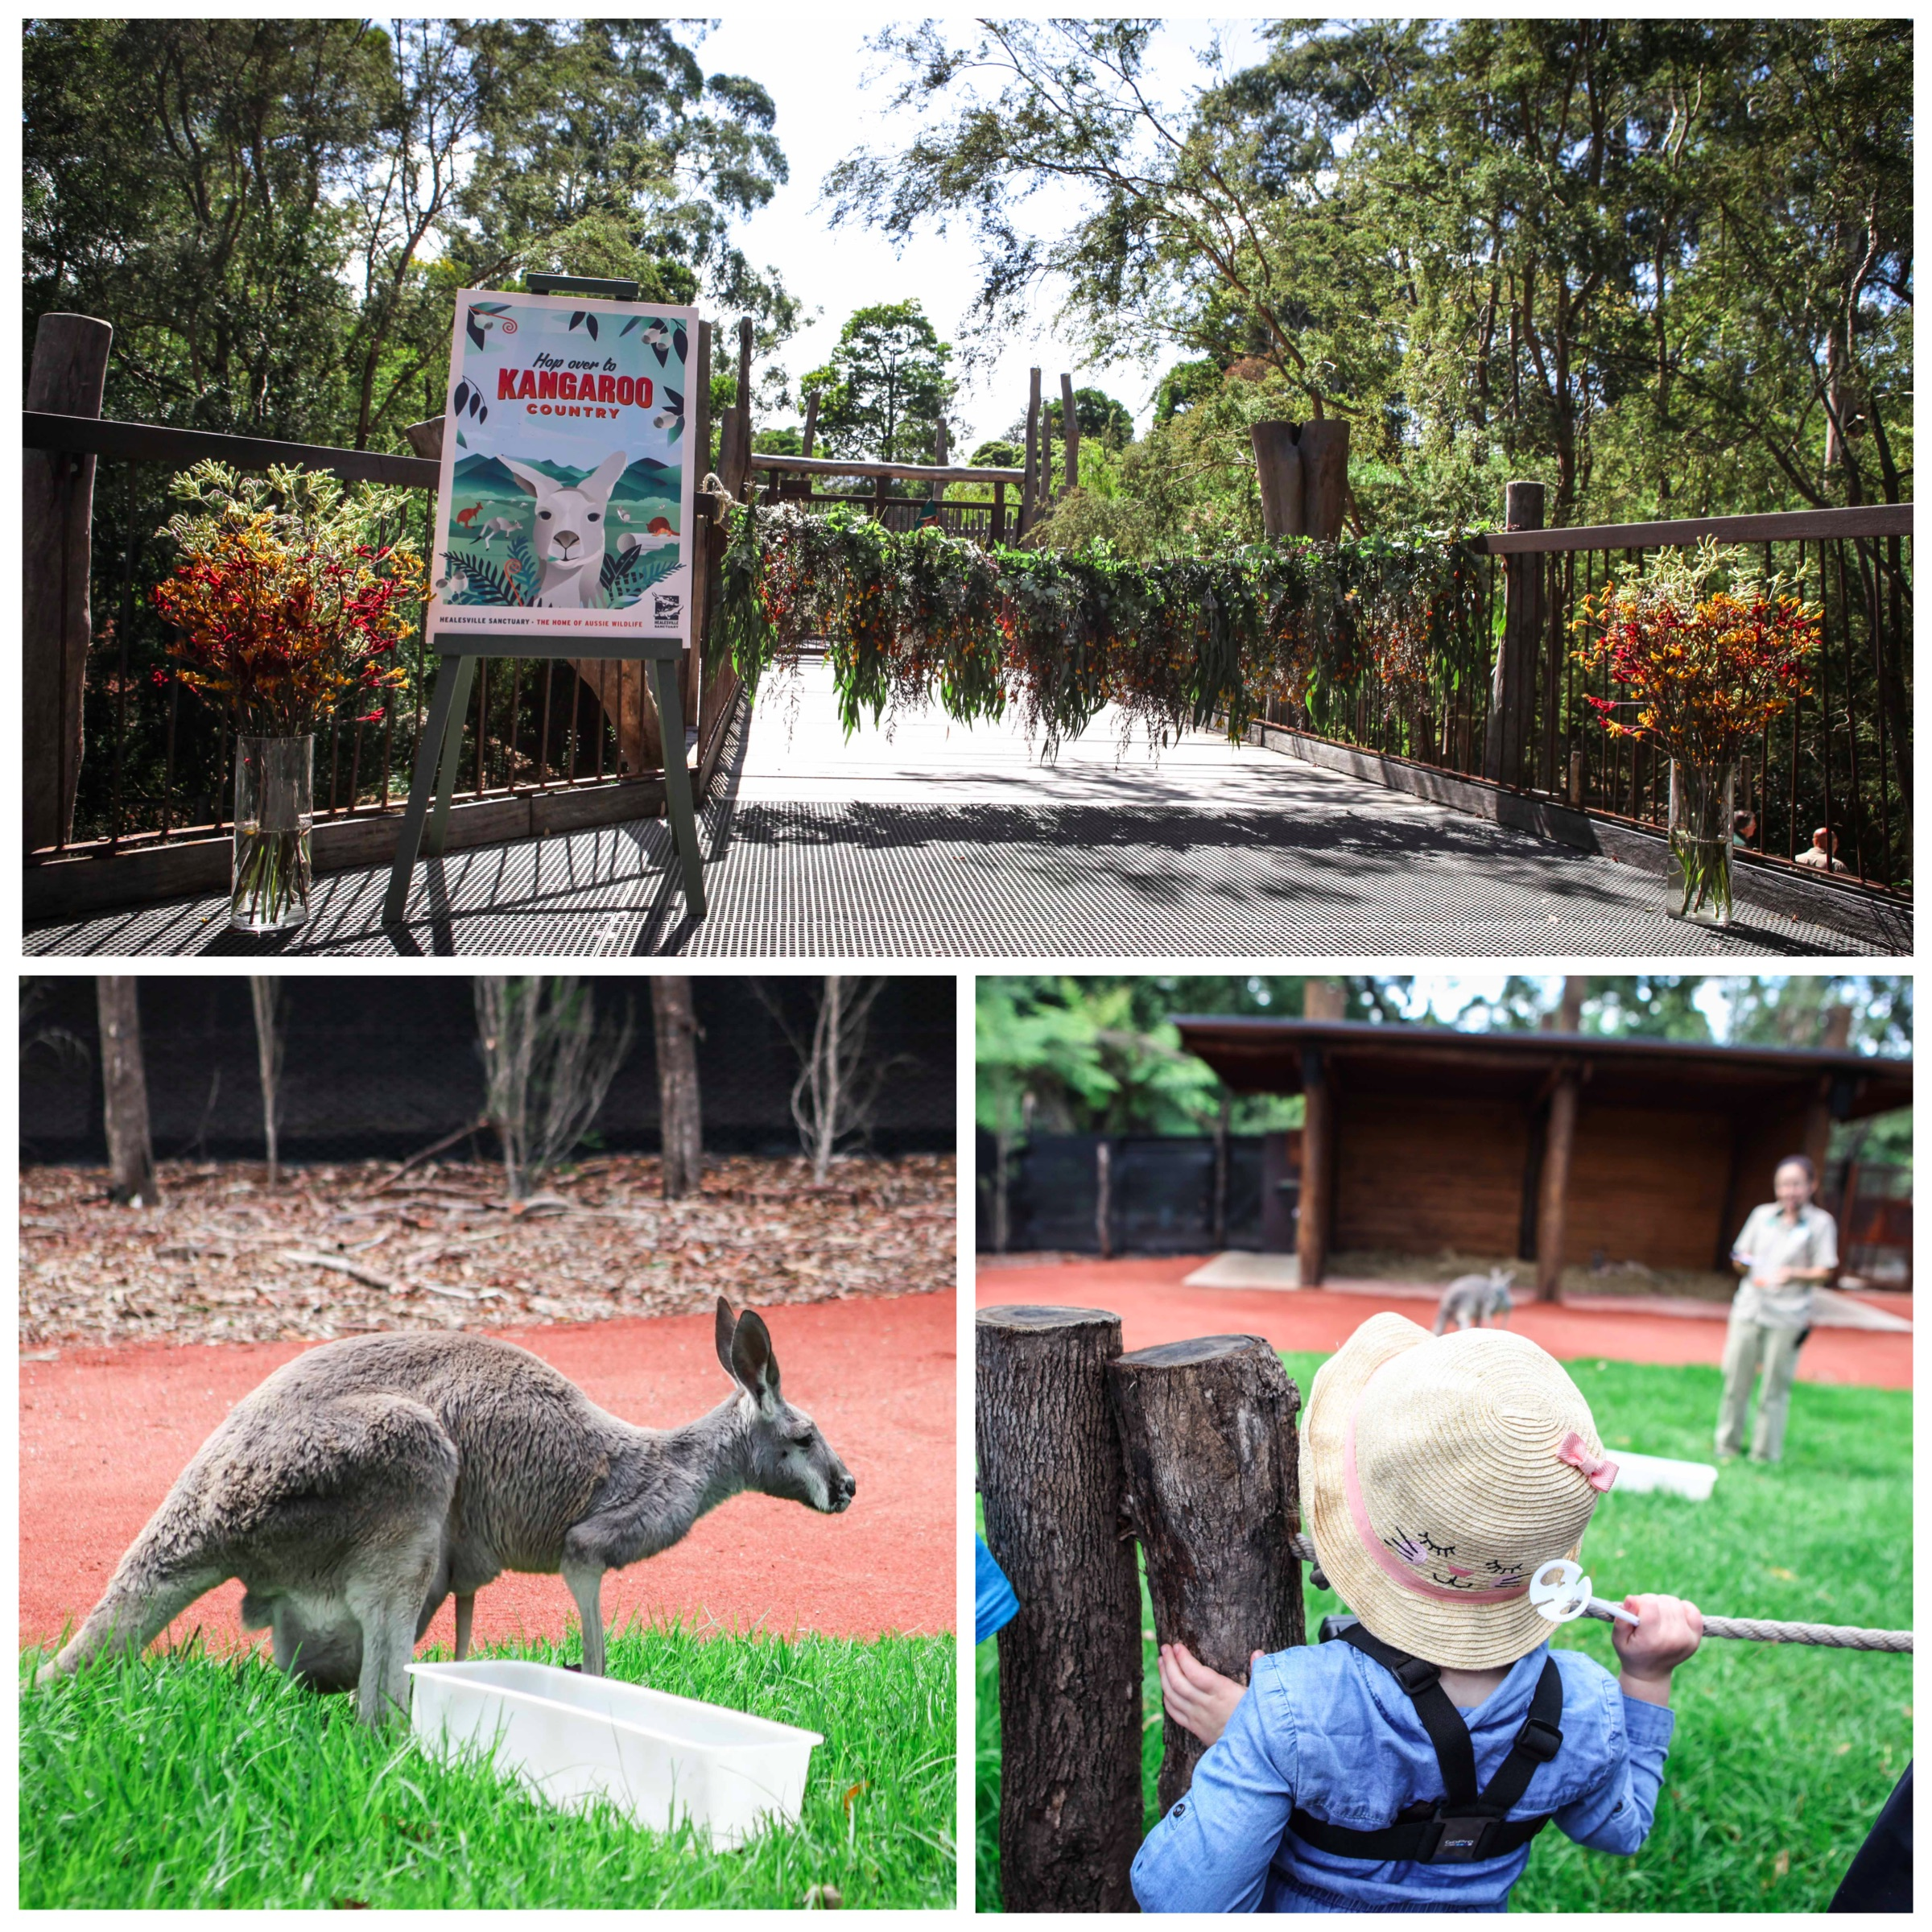 Mamma Knows East - Healesville Sanctuary Kangaroo Country 1.jpg